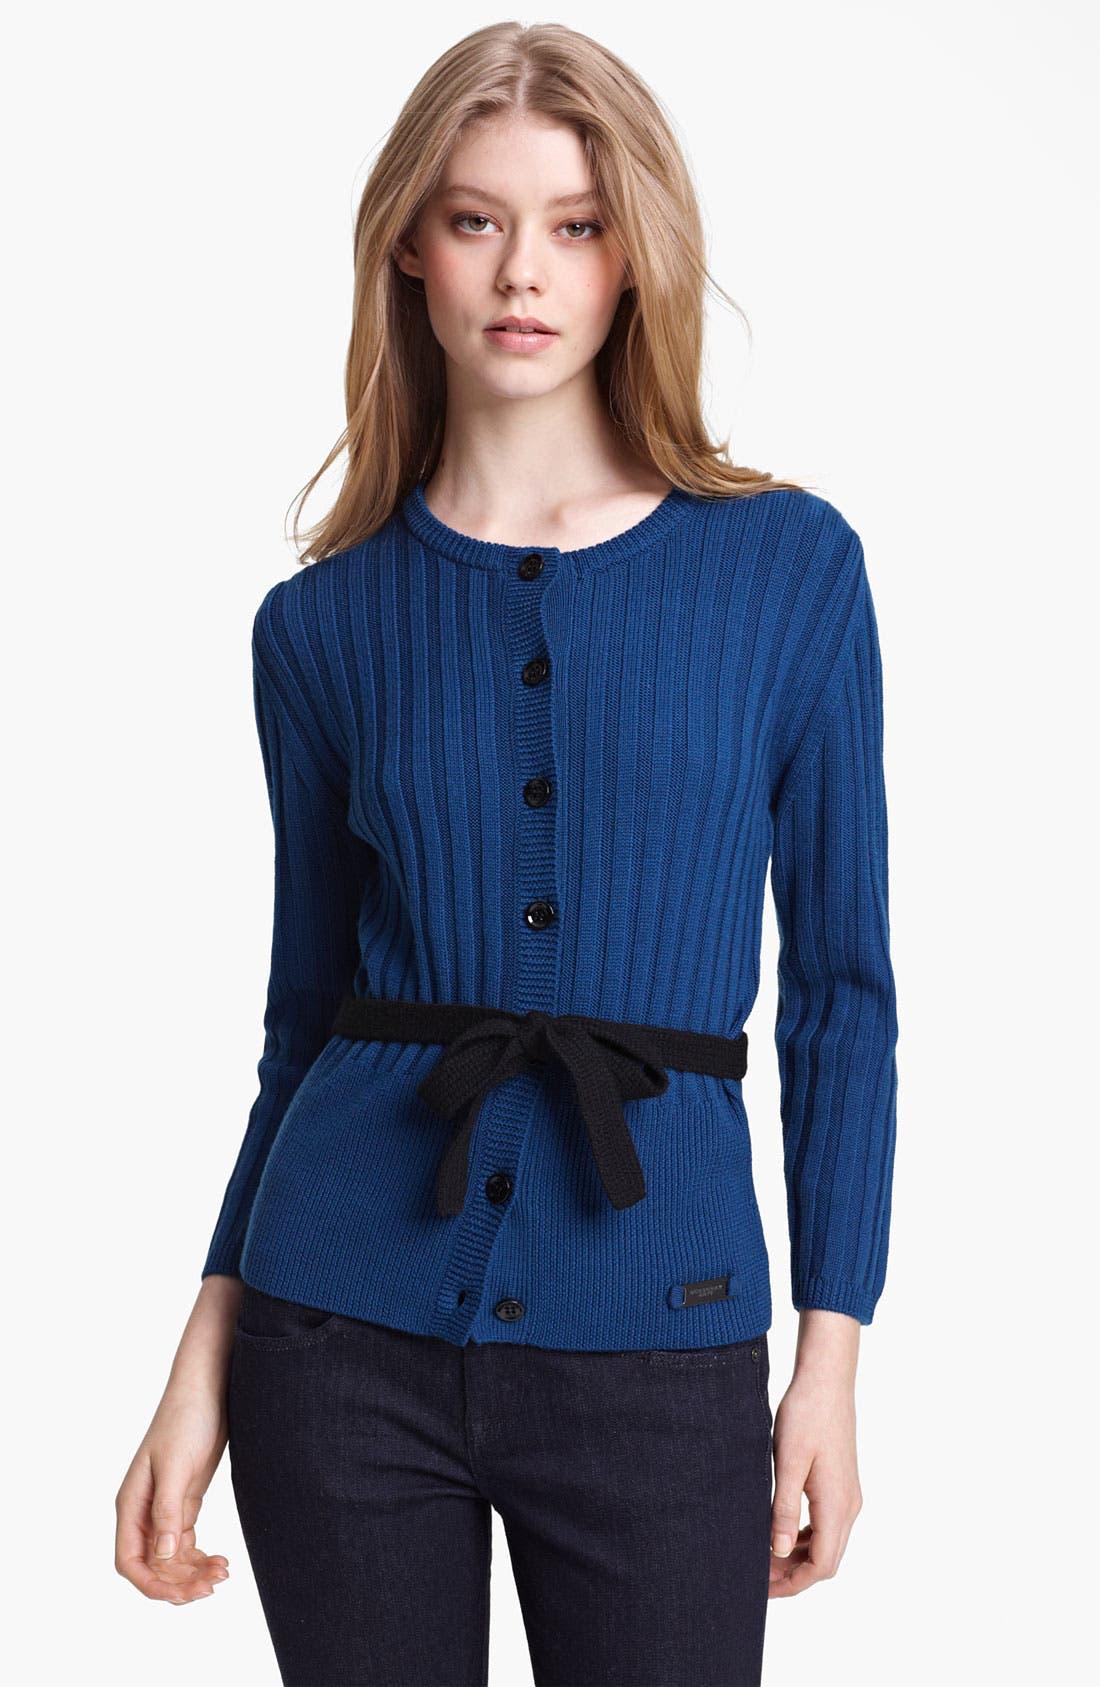 Main Image - Burberry Brit Knit Merino Wool Cardigan